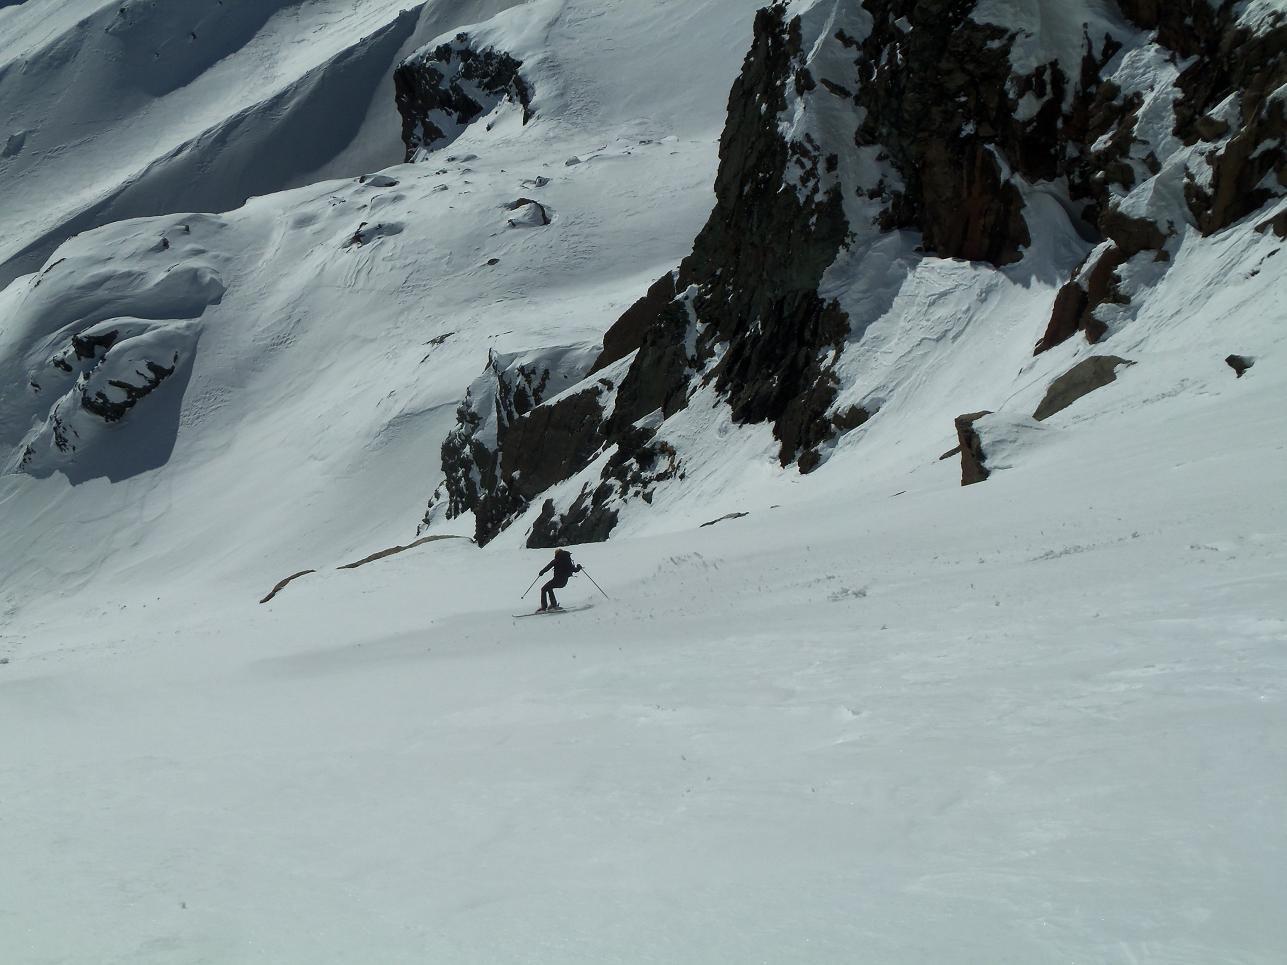 mett impeccabile du bon ski